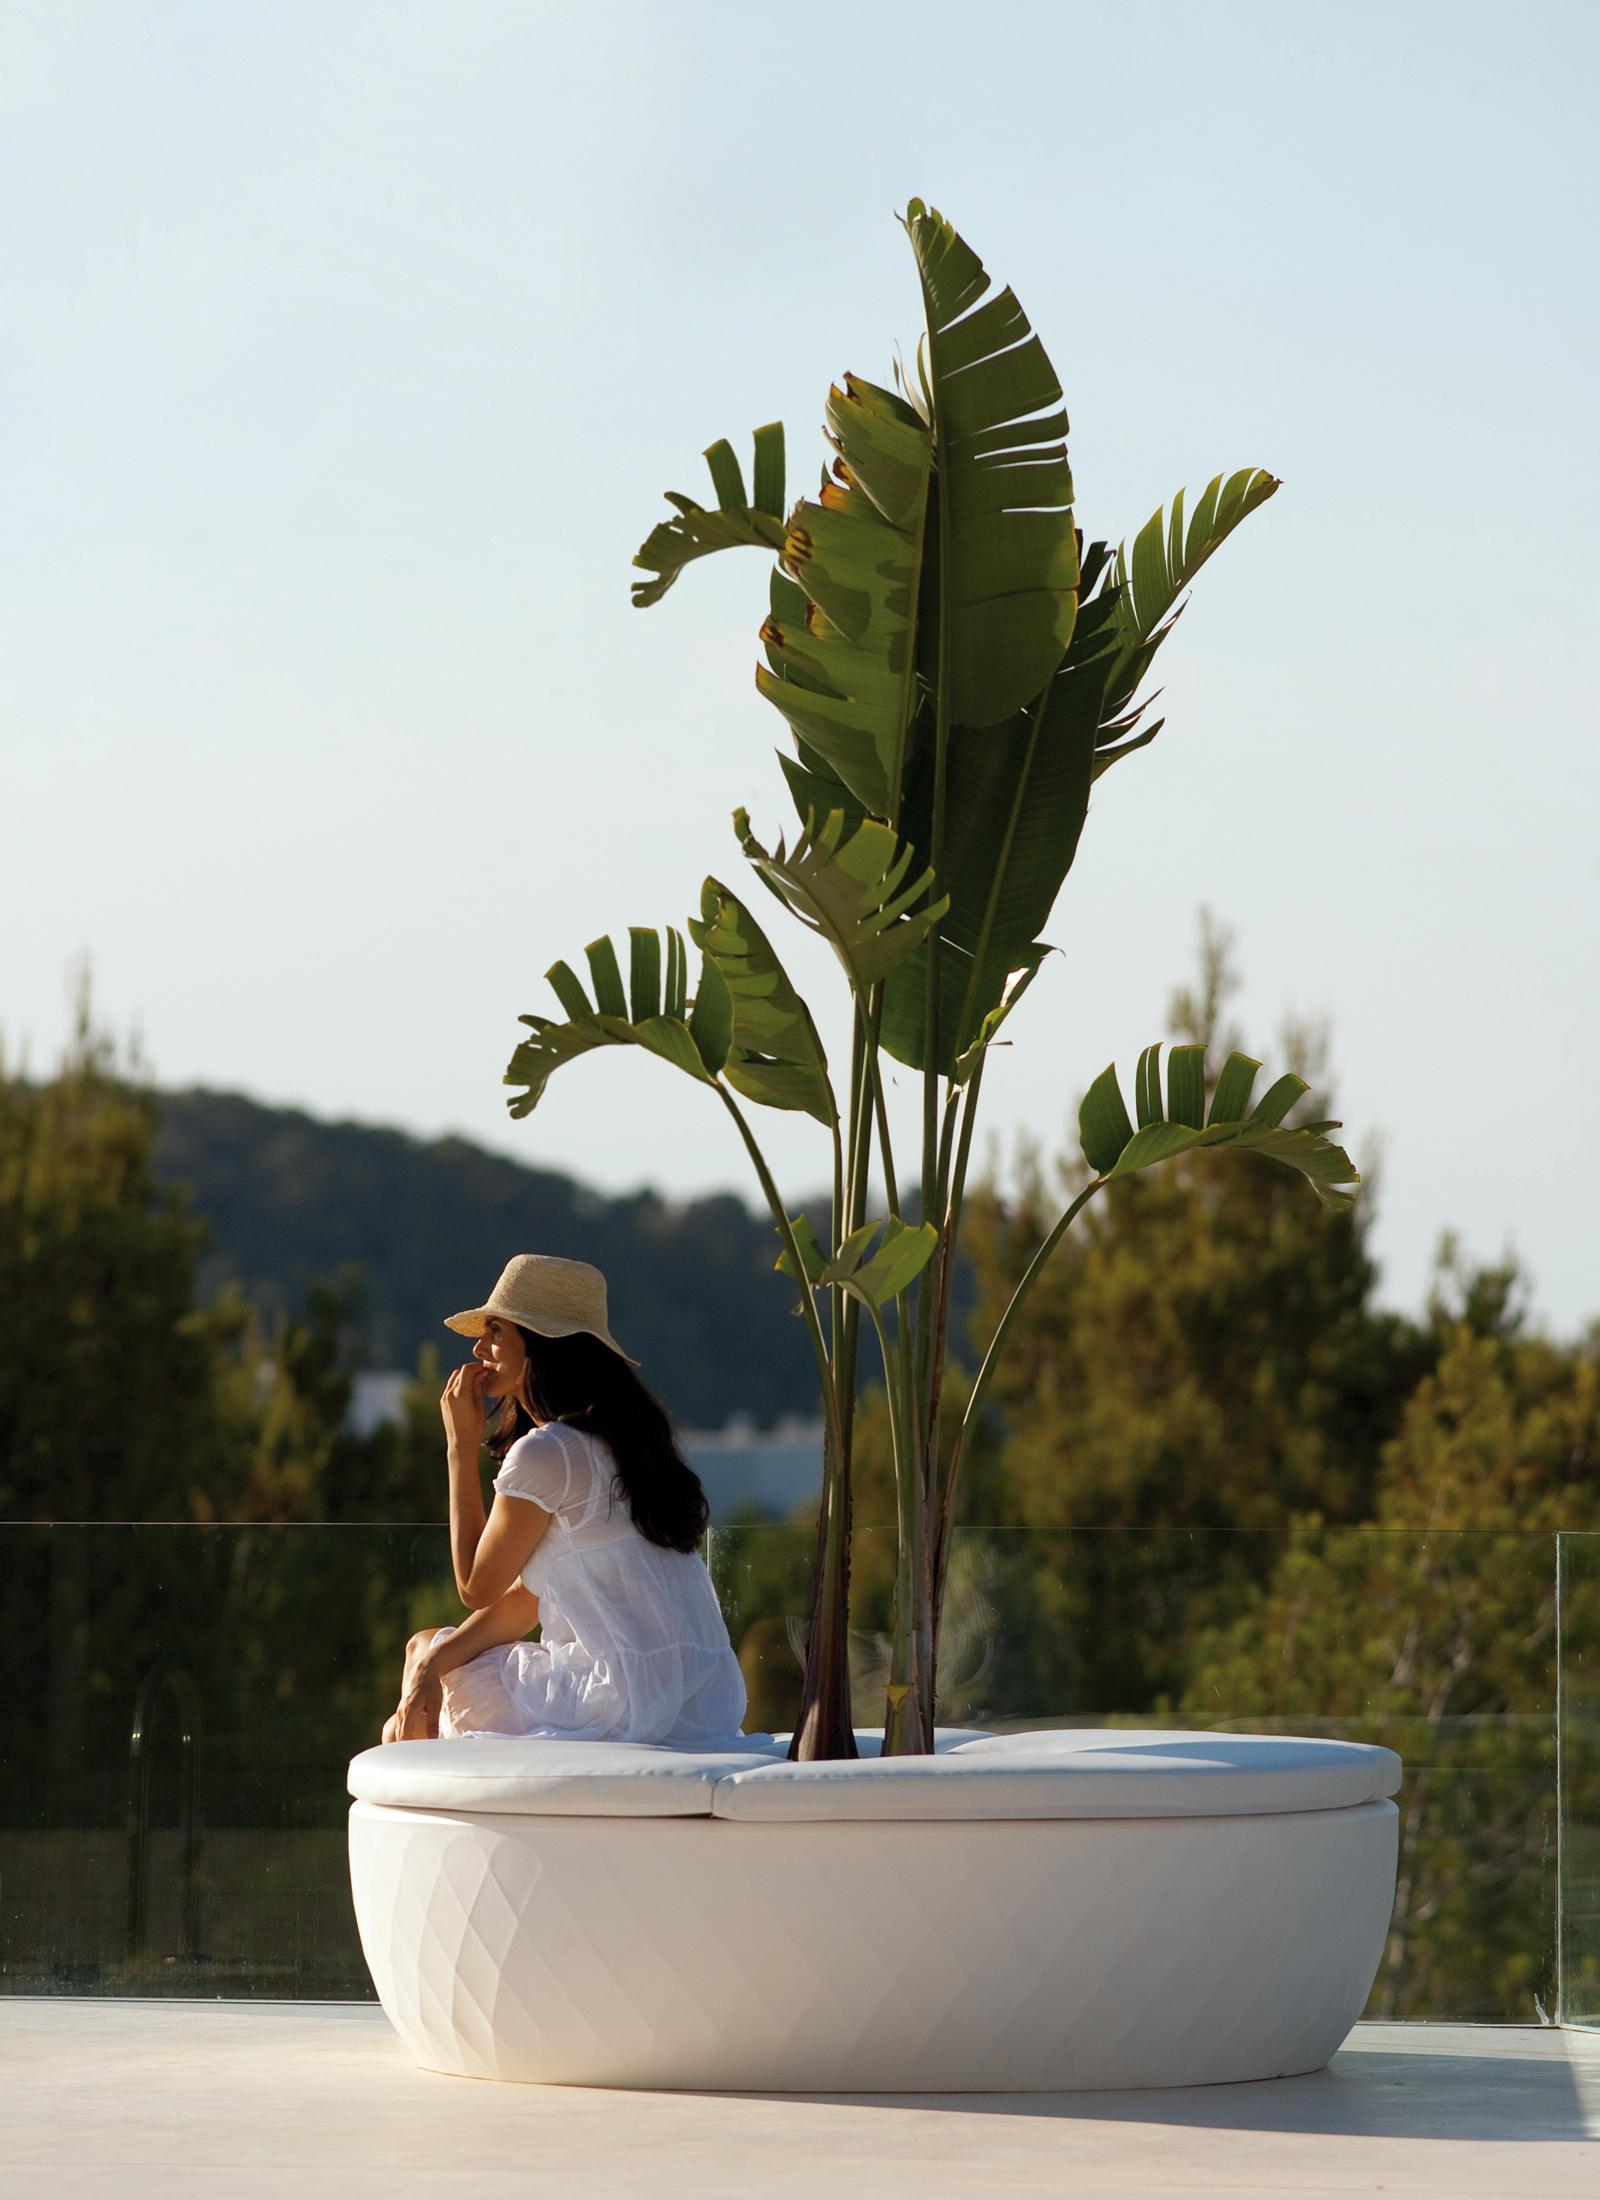 vases isla flowerpots planters from vondom architonic. Black Bedroom Furniture Sets. Home Design Ideas